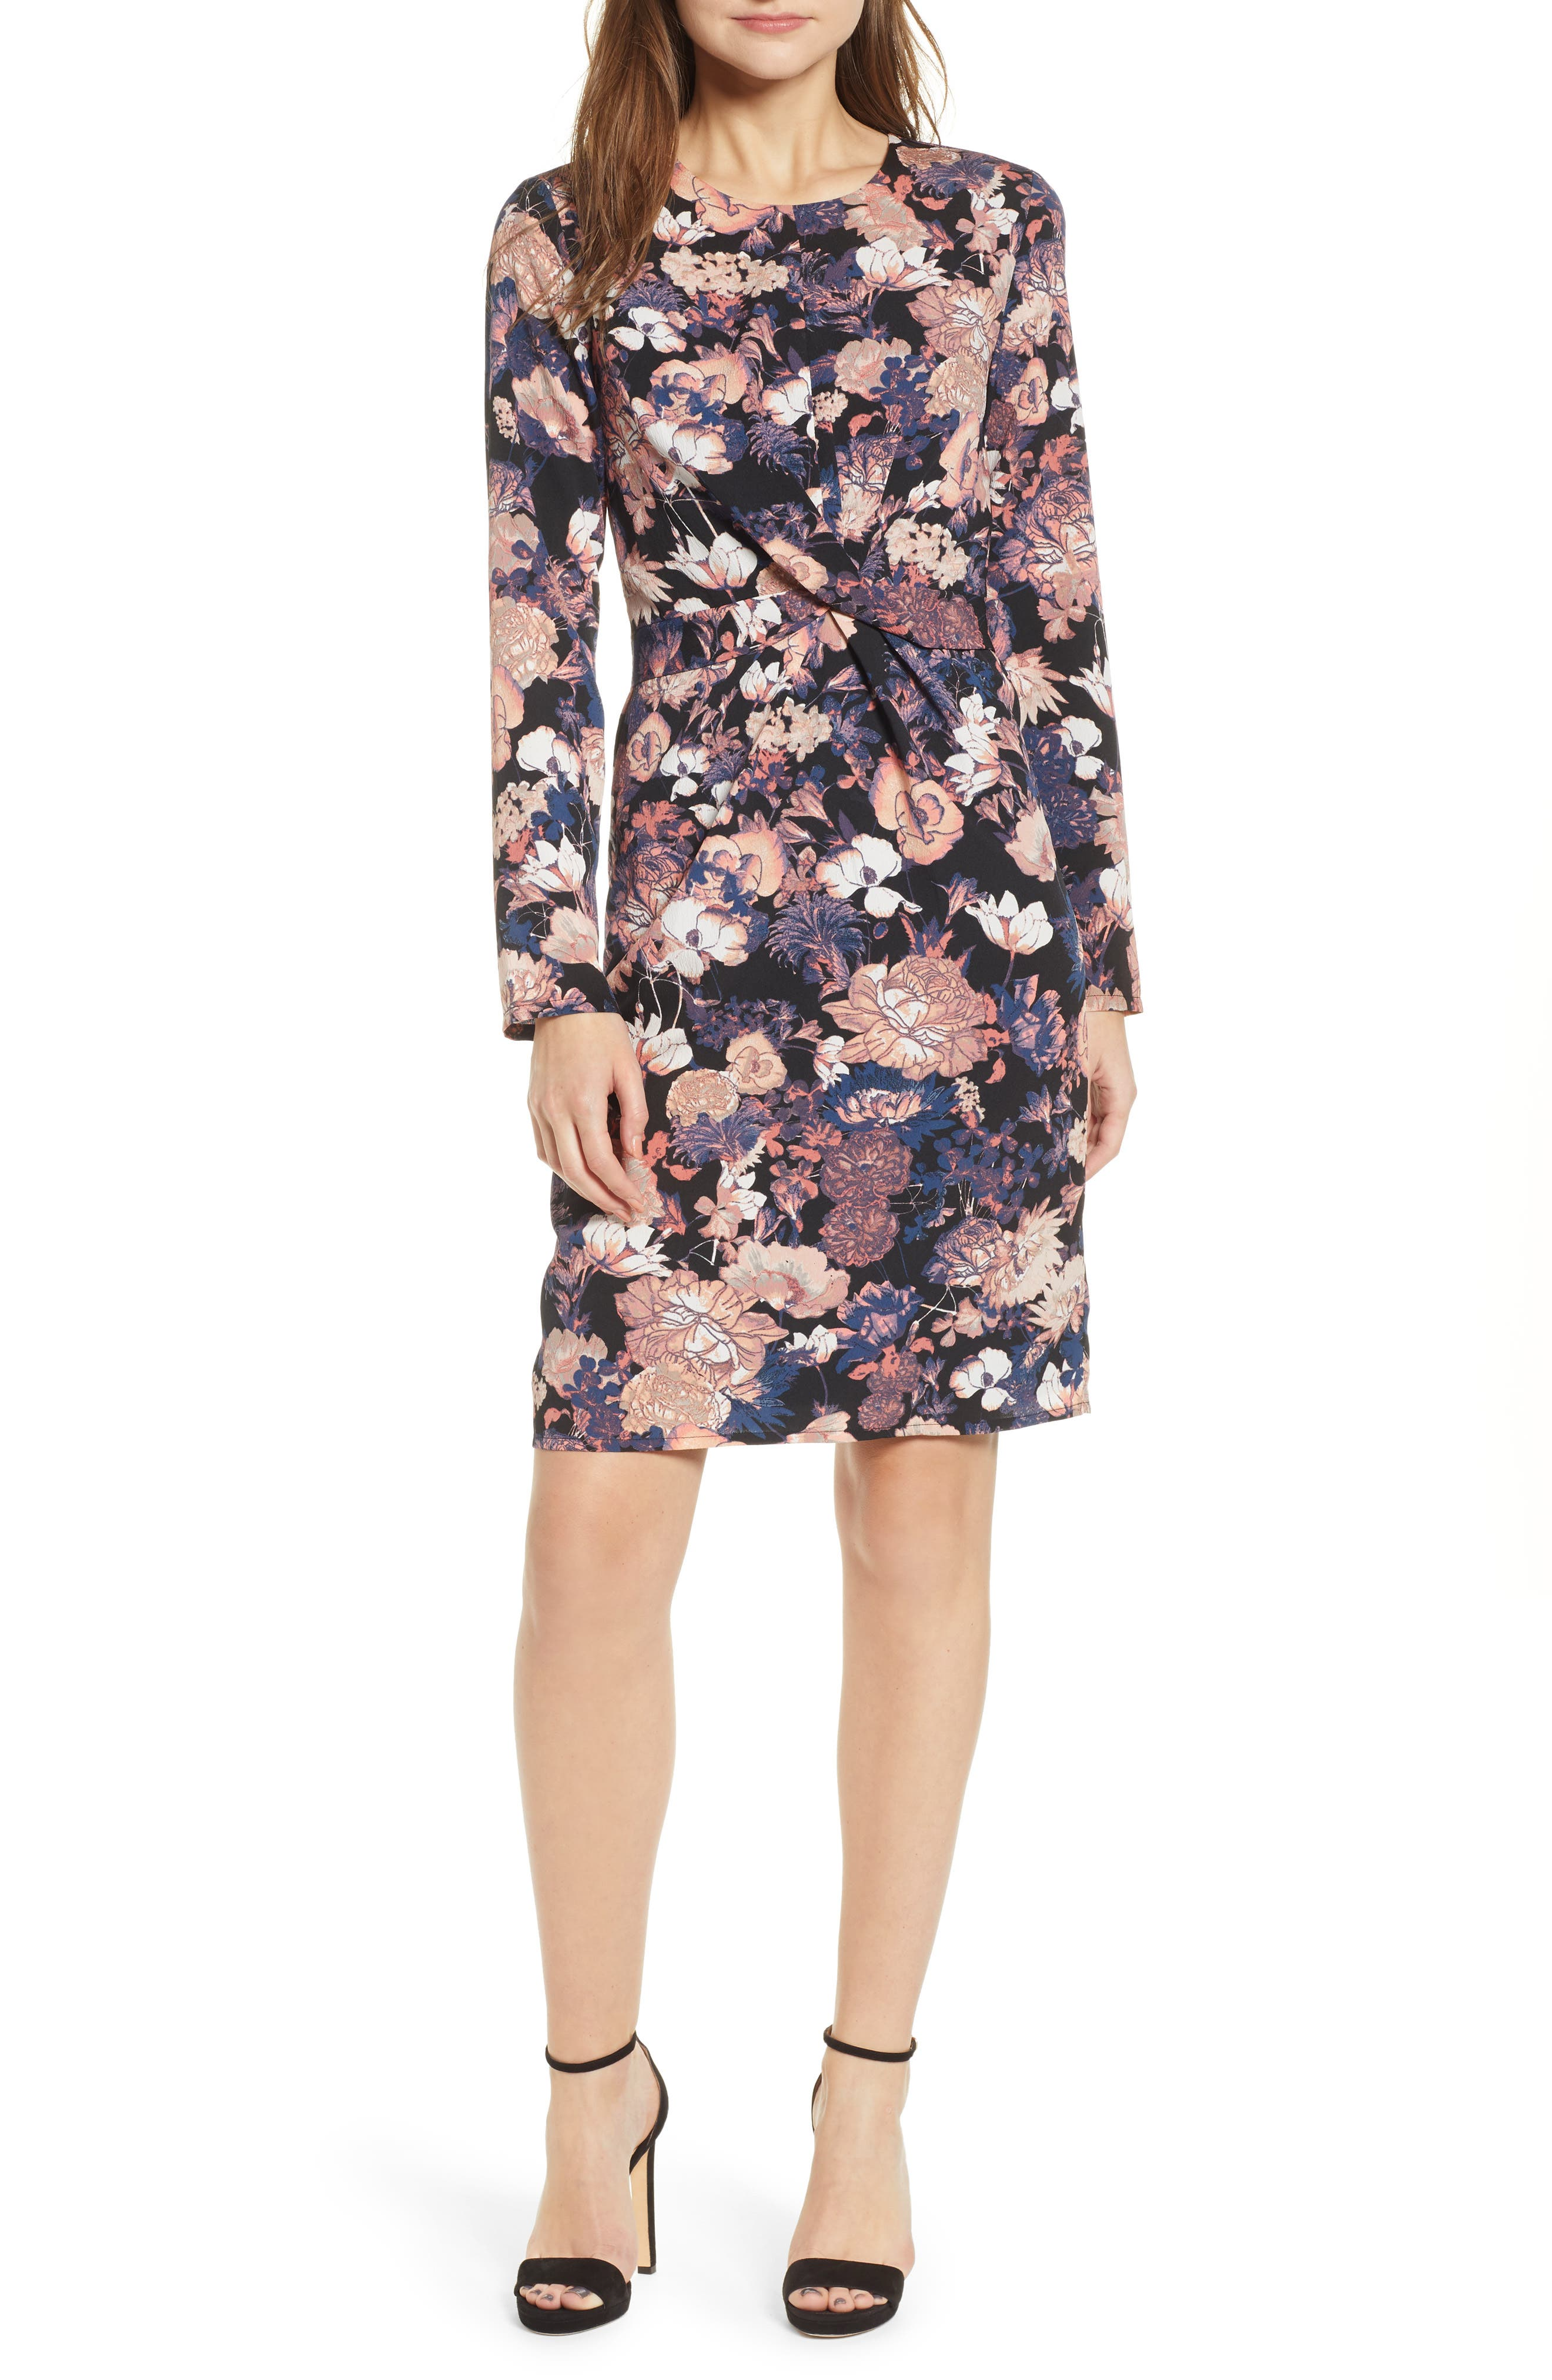 VERO MODA,                             Marlene Floral Drape Dress,                             Main thumbnail 1, color,                             BLACK PRINT